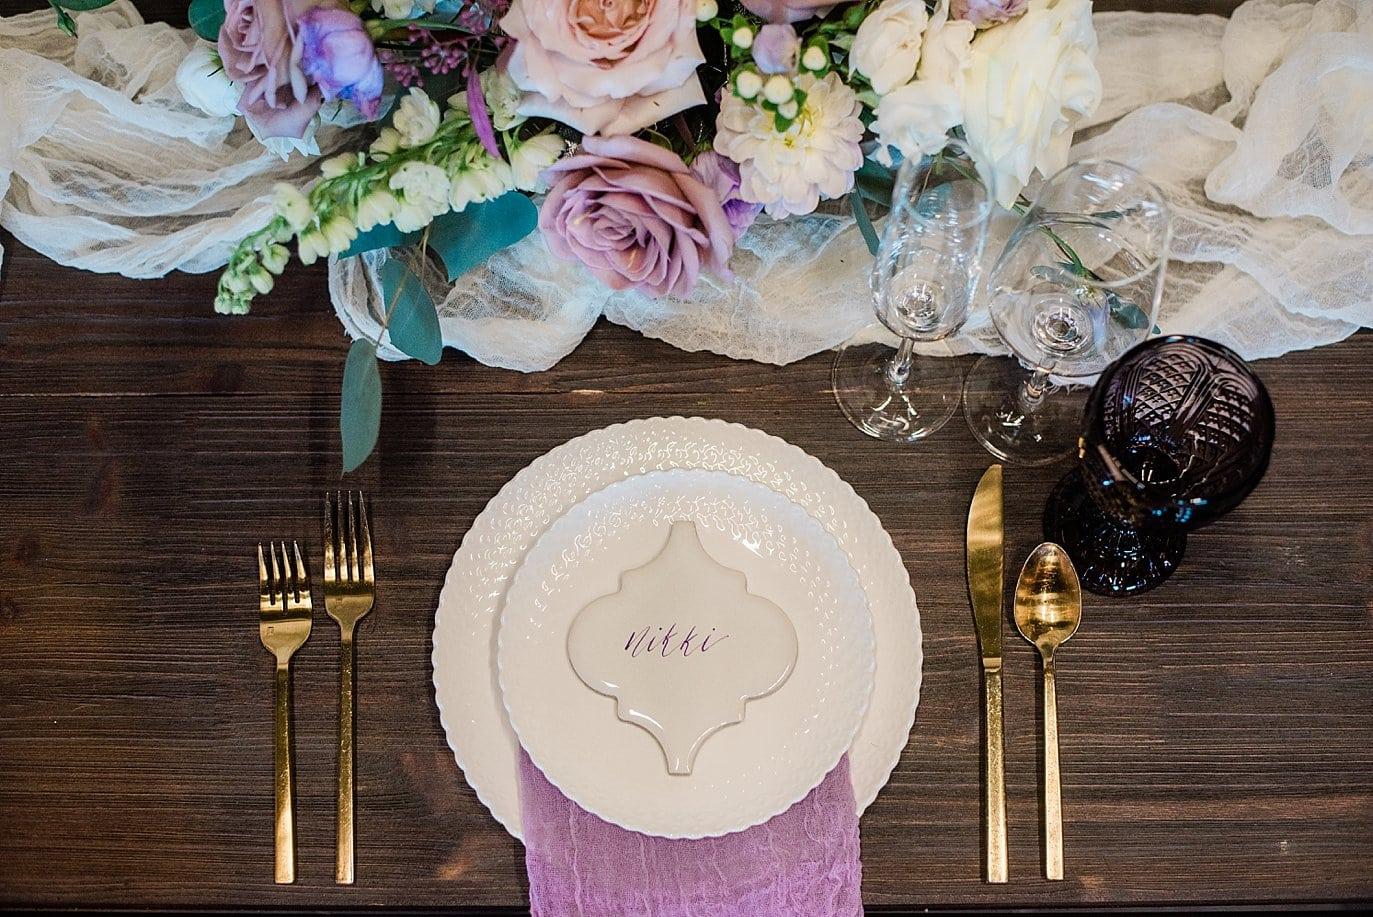 ceramic tile name plates and purple linen napkins at Shyft Denver wedding by Lyons wedding photographer Jennie Crate